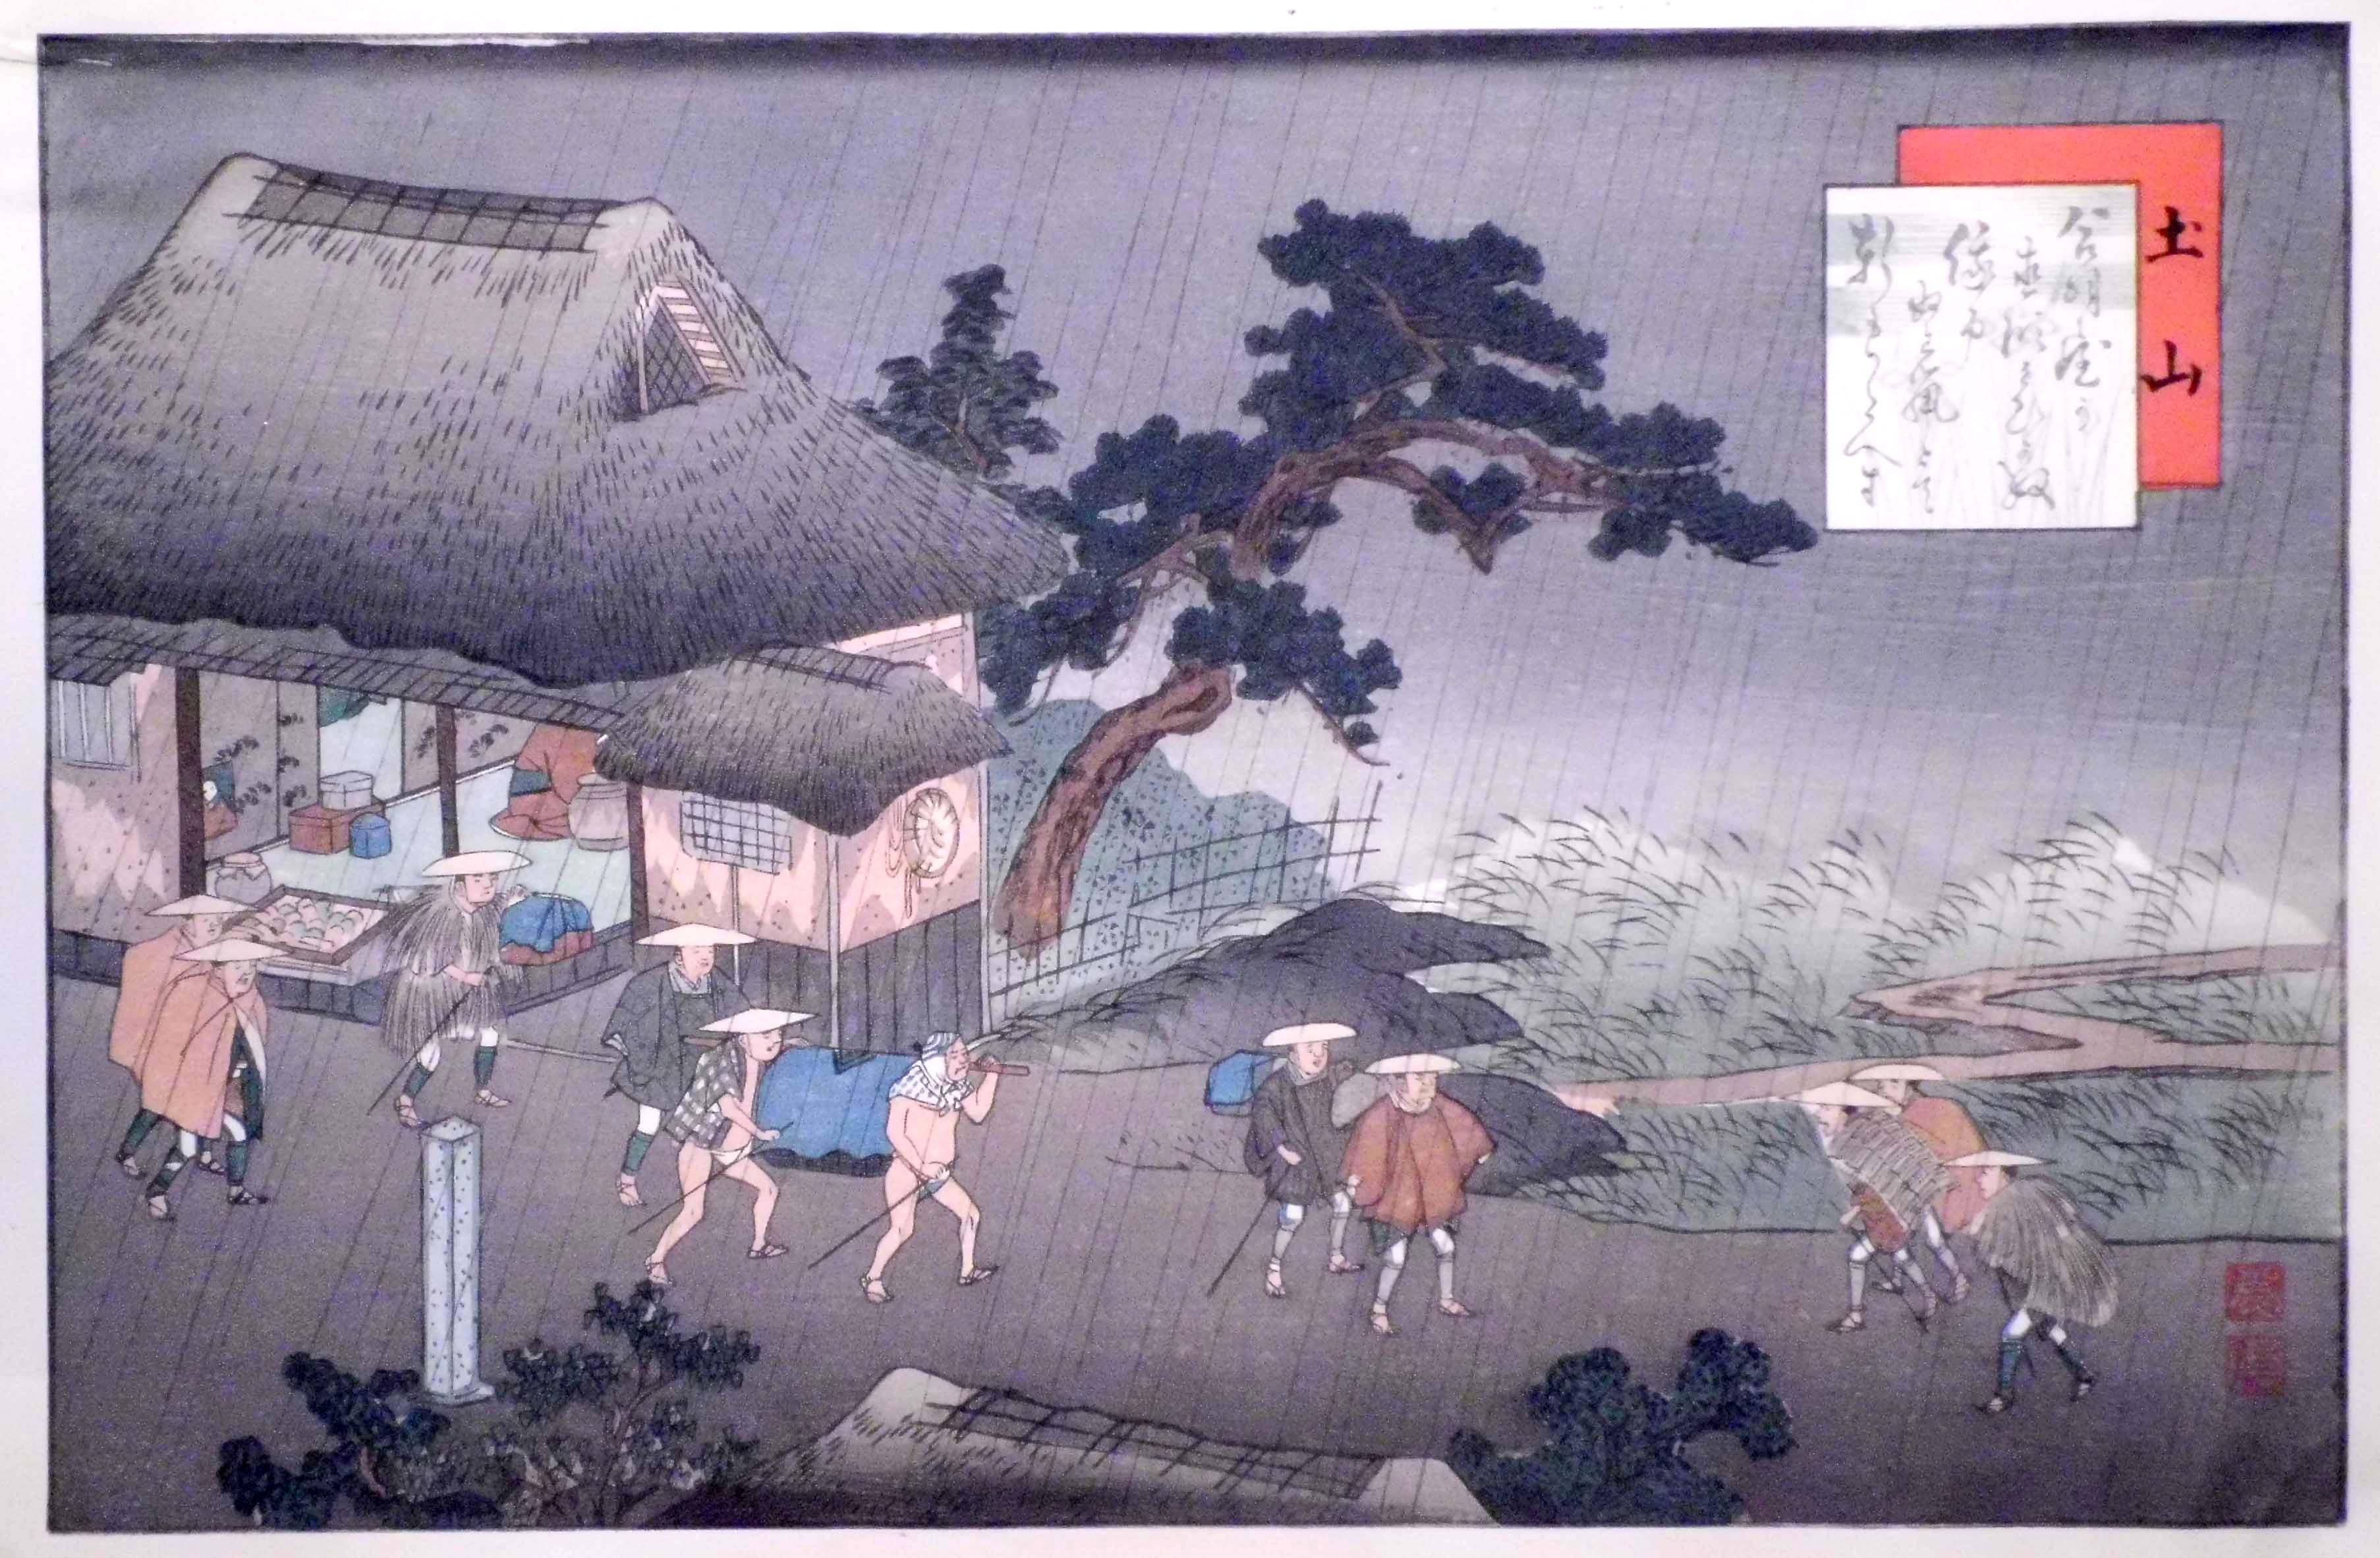 Fujikawa TAMENOBU (attivo nel 1890/1914) – TSUCHIYAMA, QUARANTANOVESIMA STAZIONE DELLA TOKAIDO